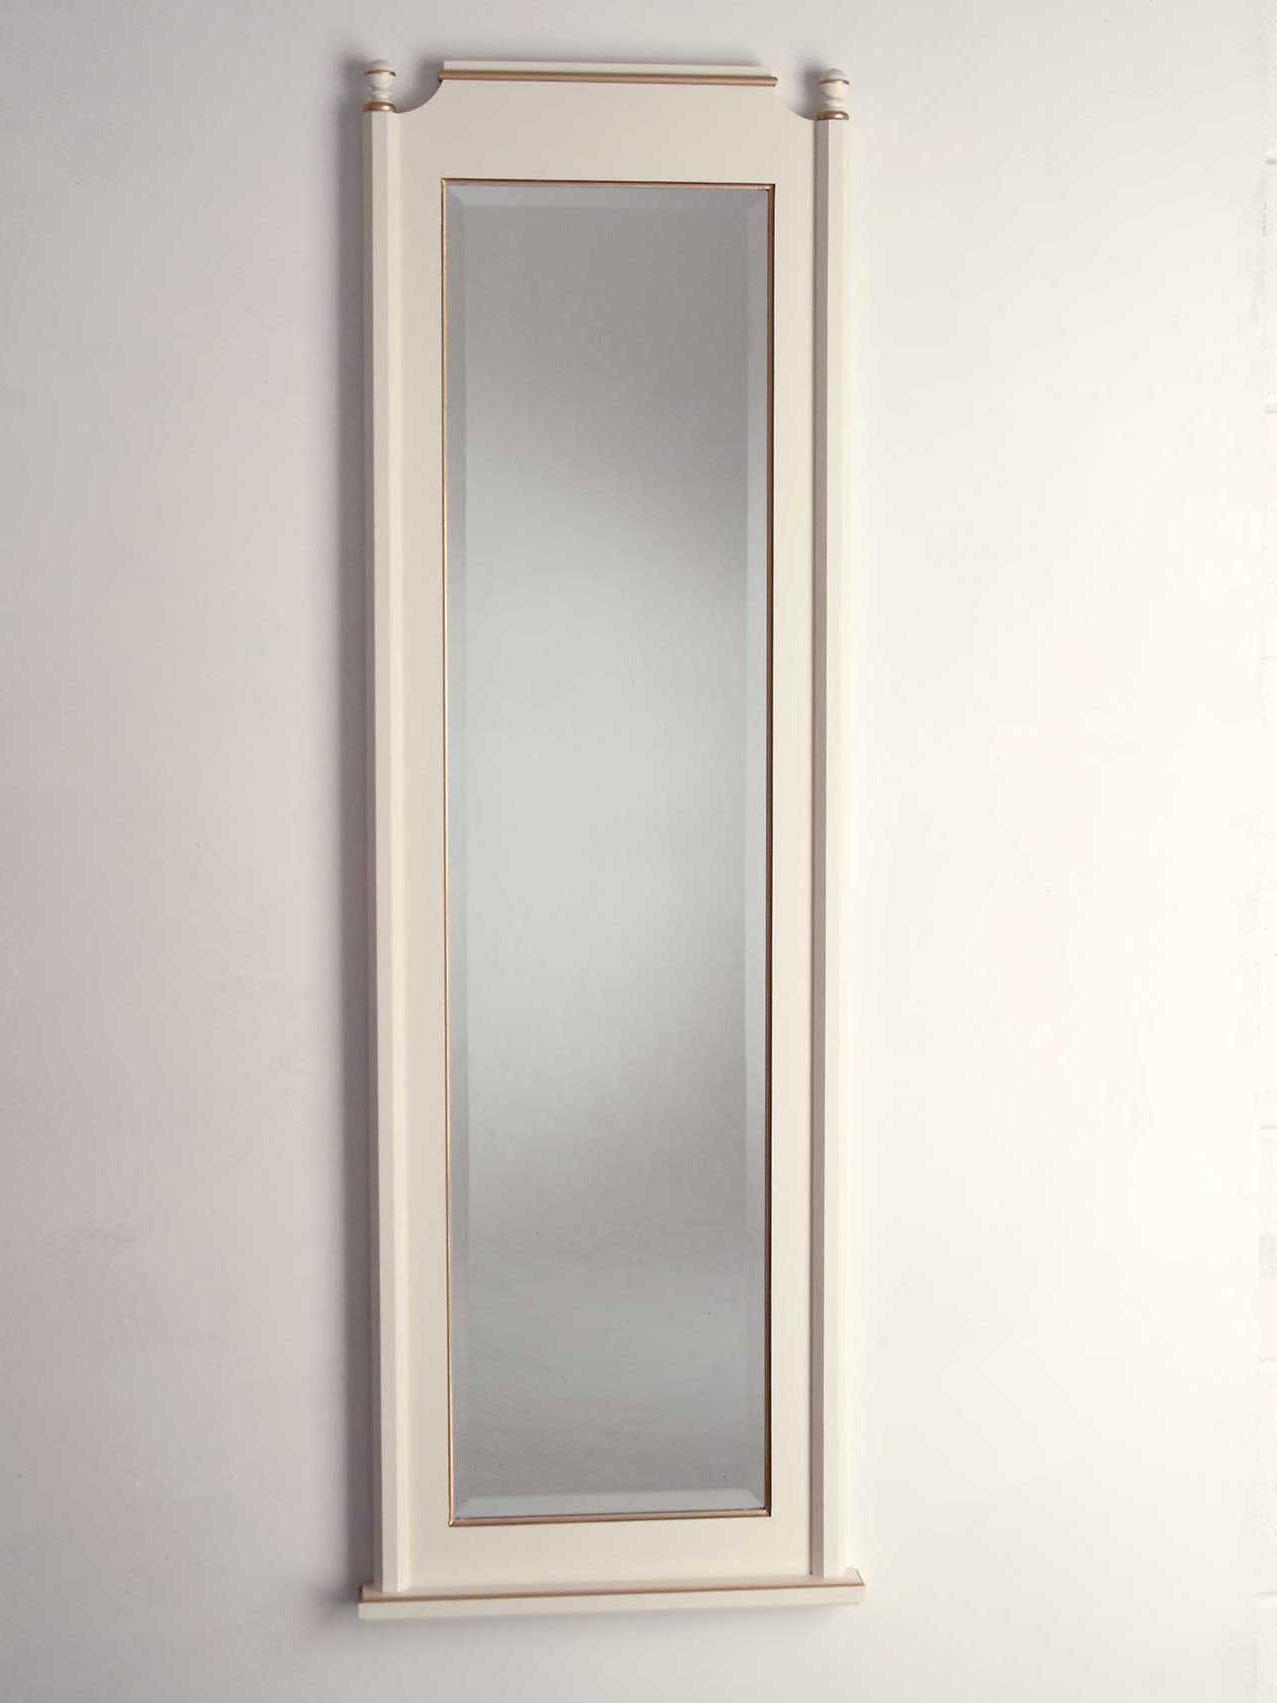 Trendy Tall Wall Mirrors Regarding Classic Tall Wall Mirror (034) – Leporello (View 8 of 20)